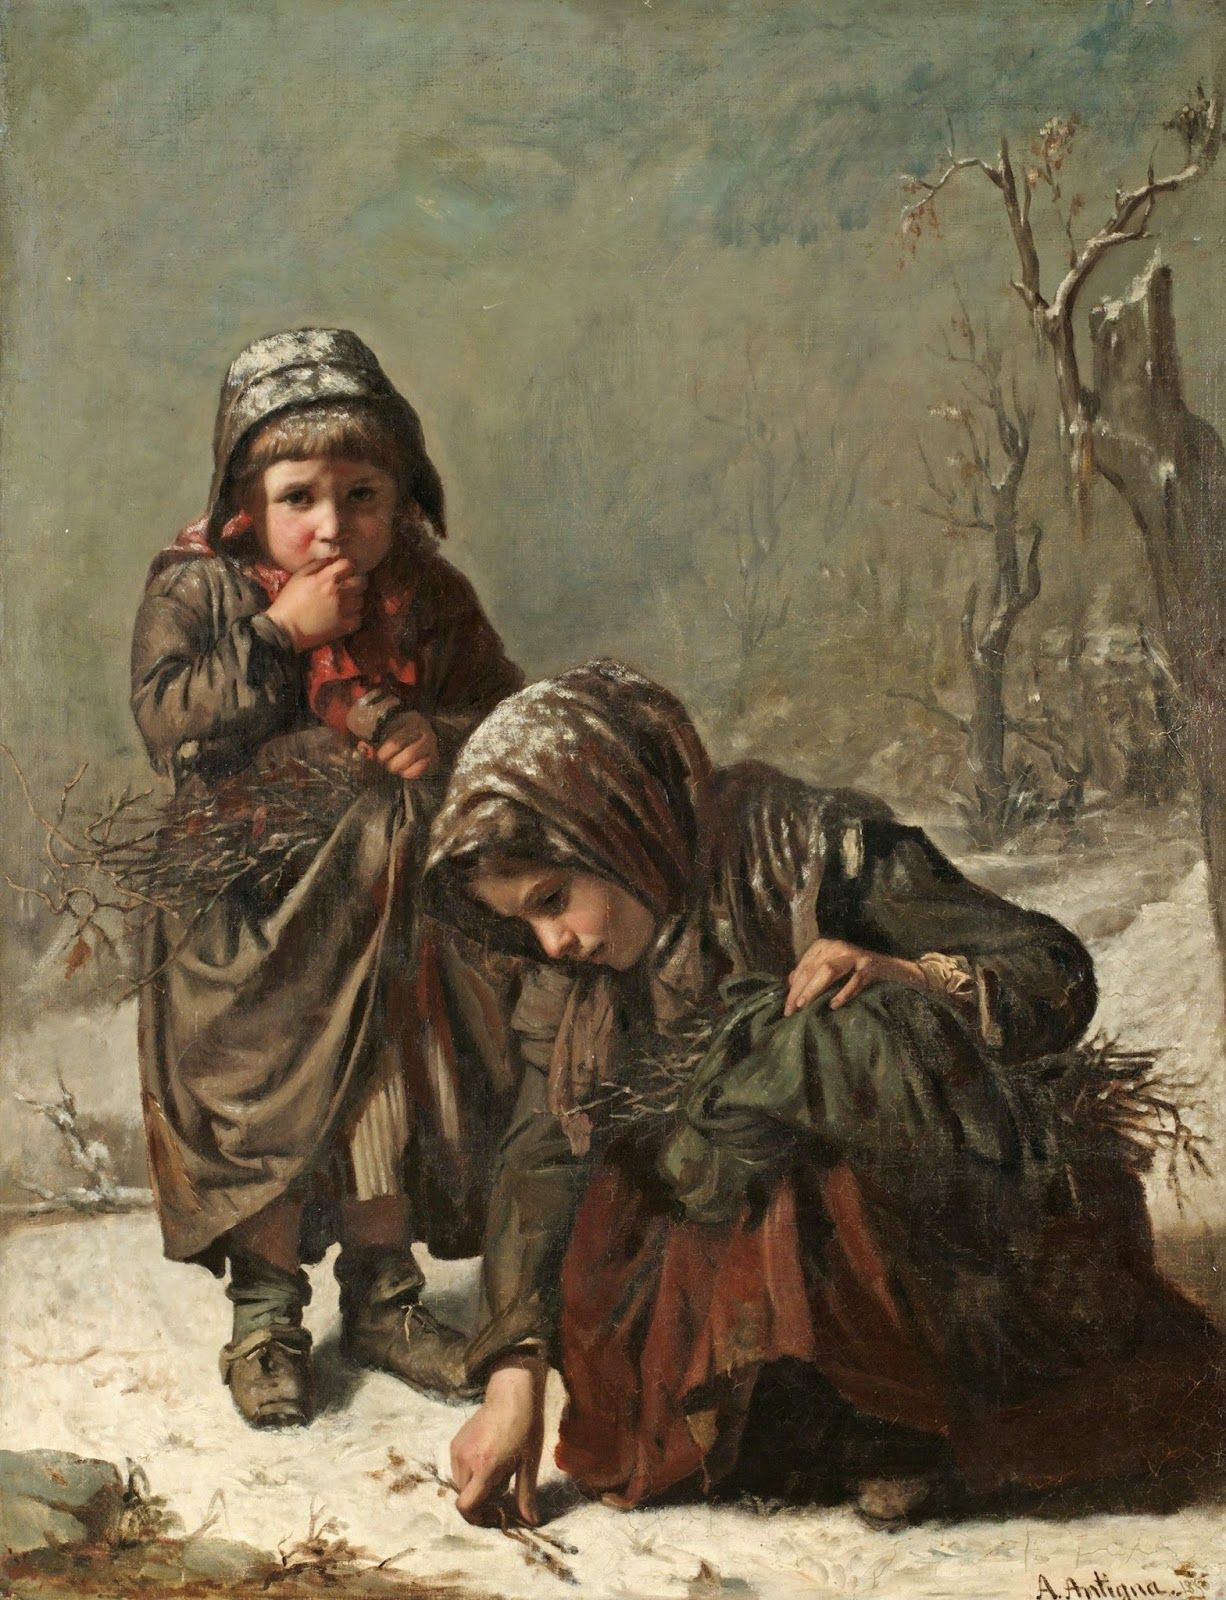 gathering sticks 1850 peinture